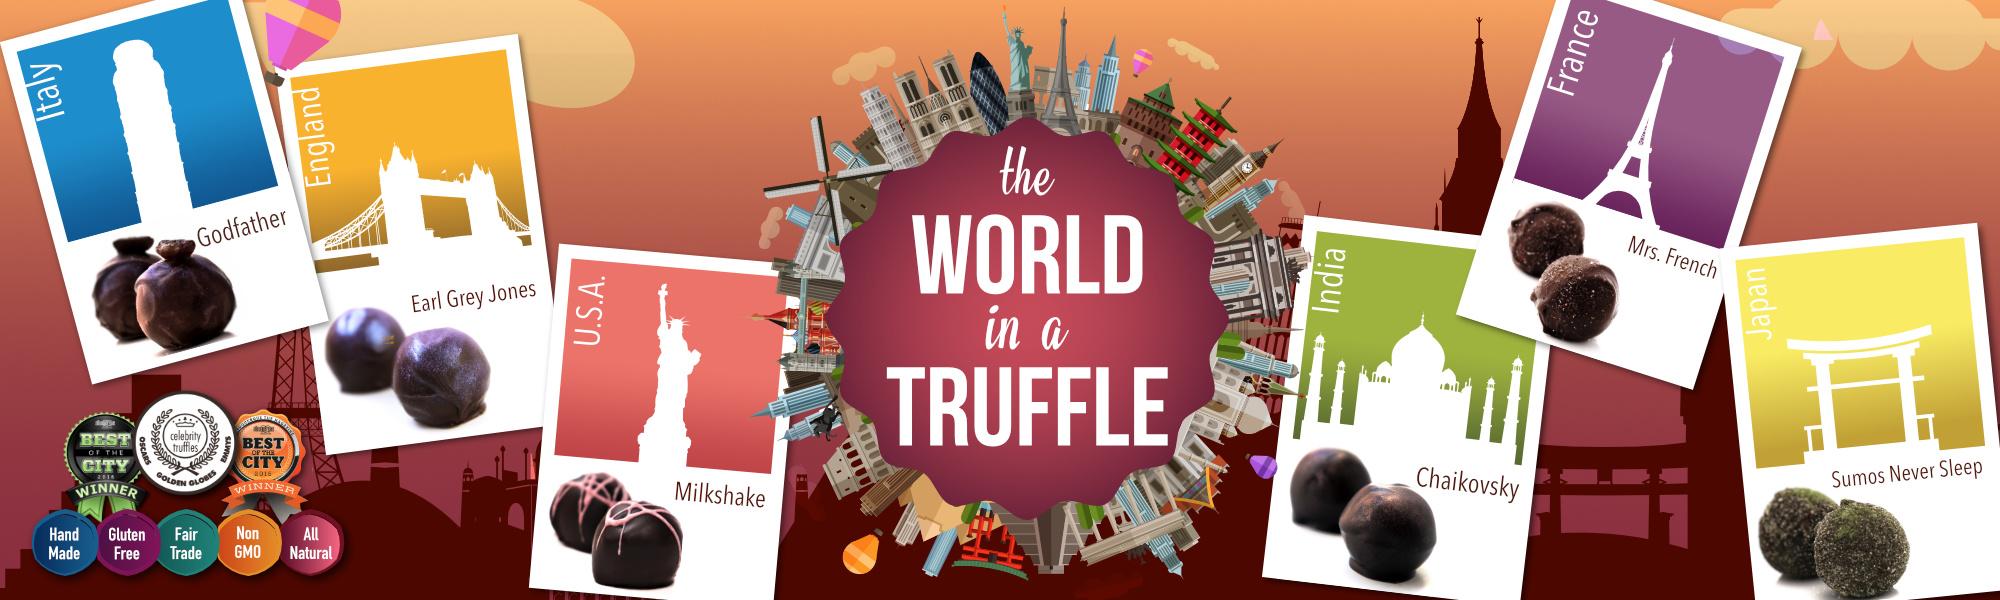 best chocolate, gluten free chocolate, truffles, best chocolate gifts